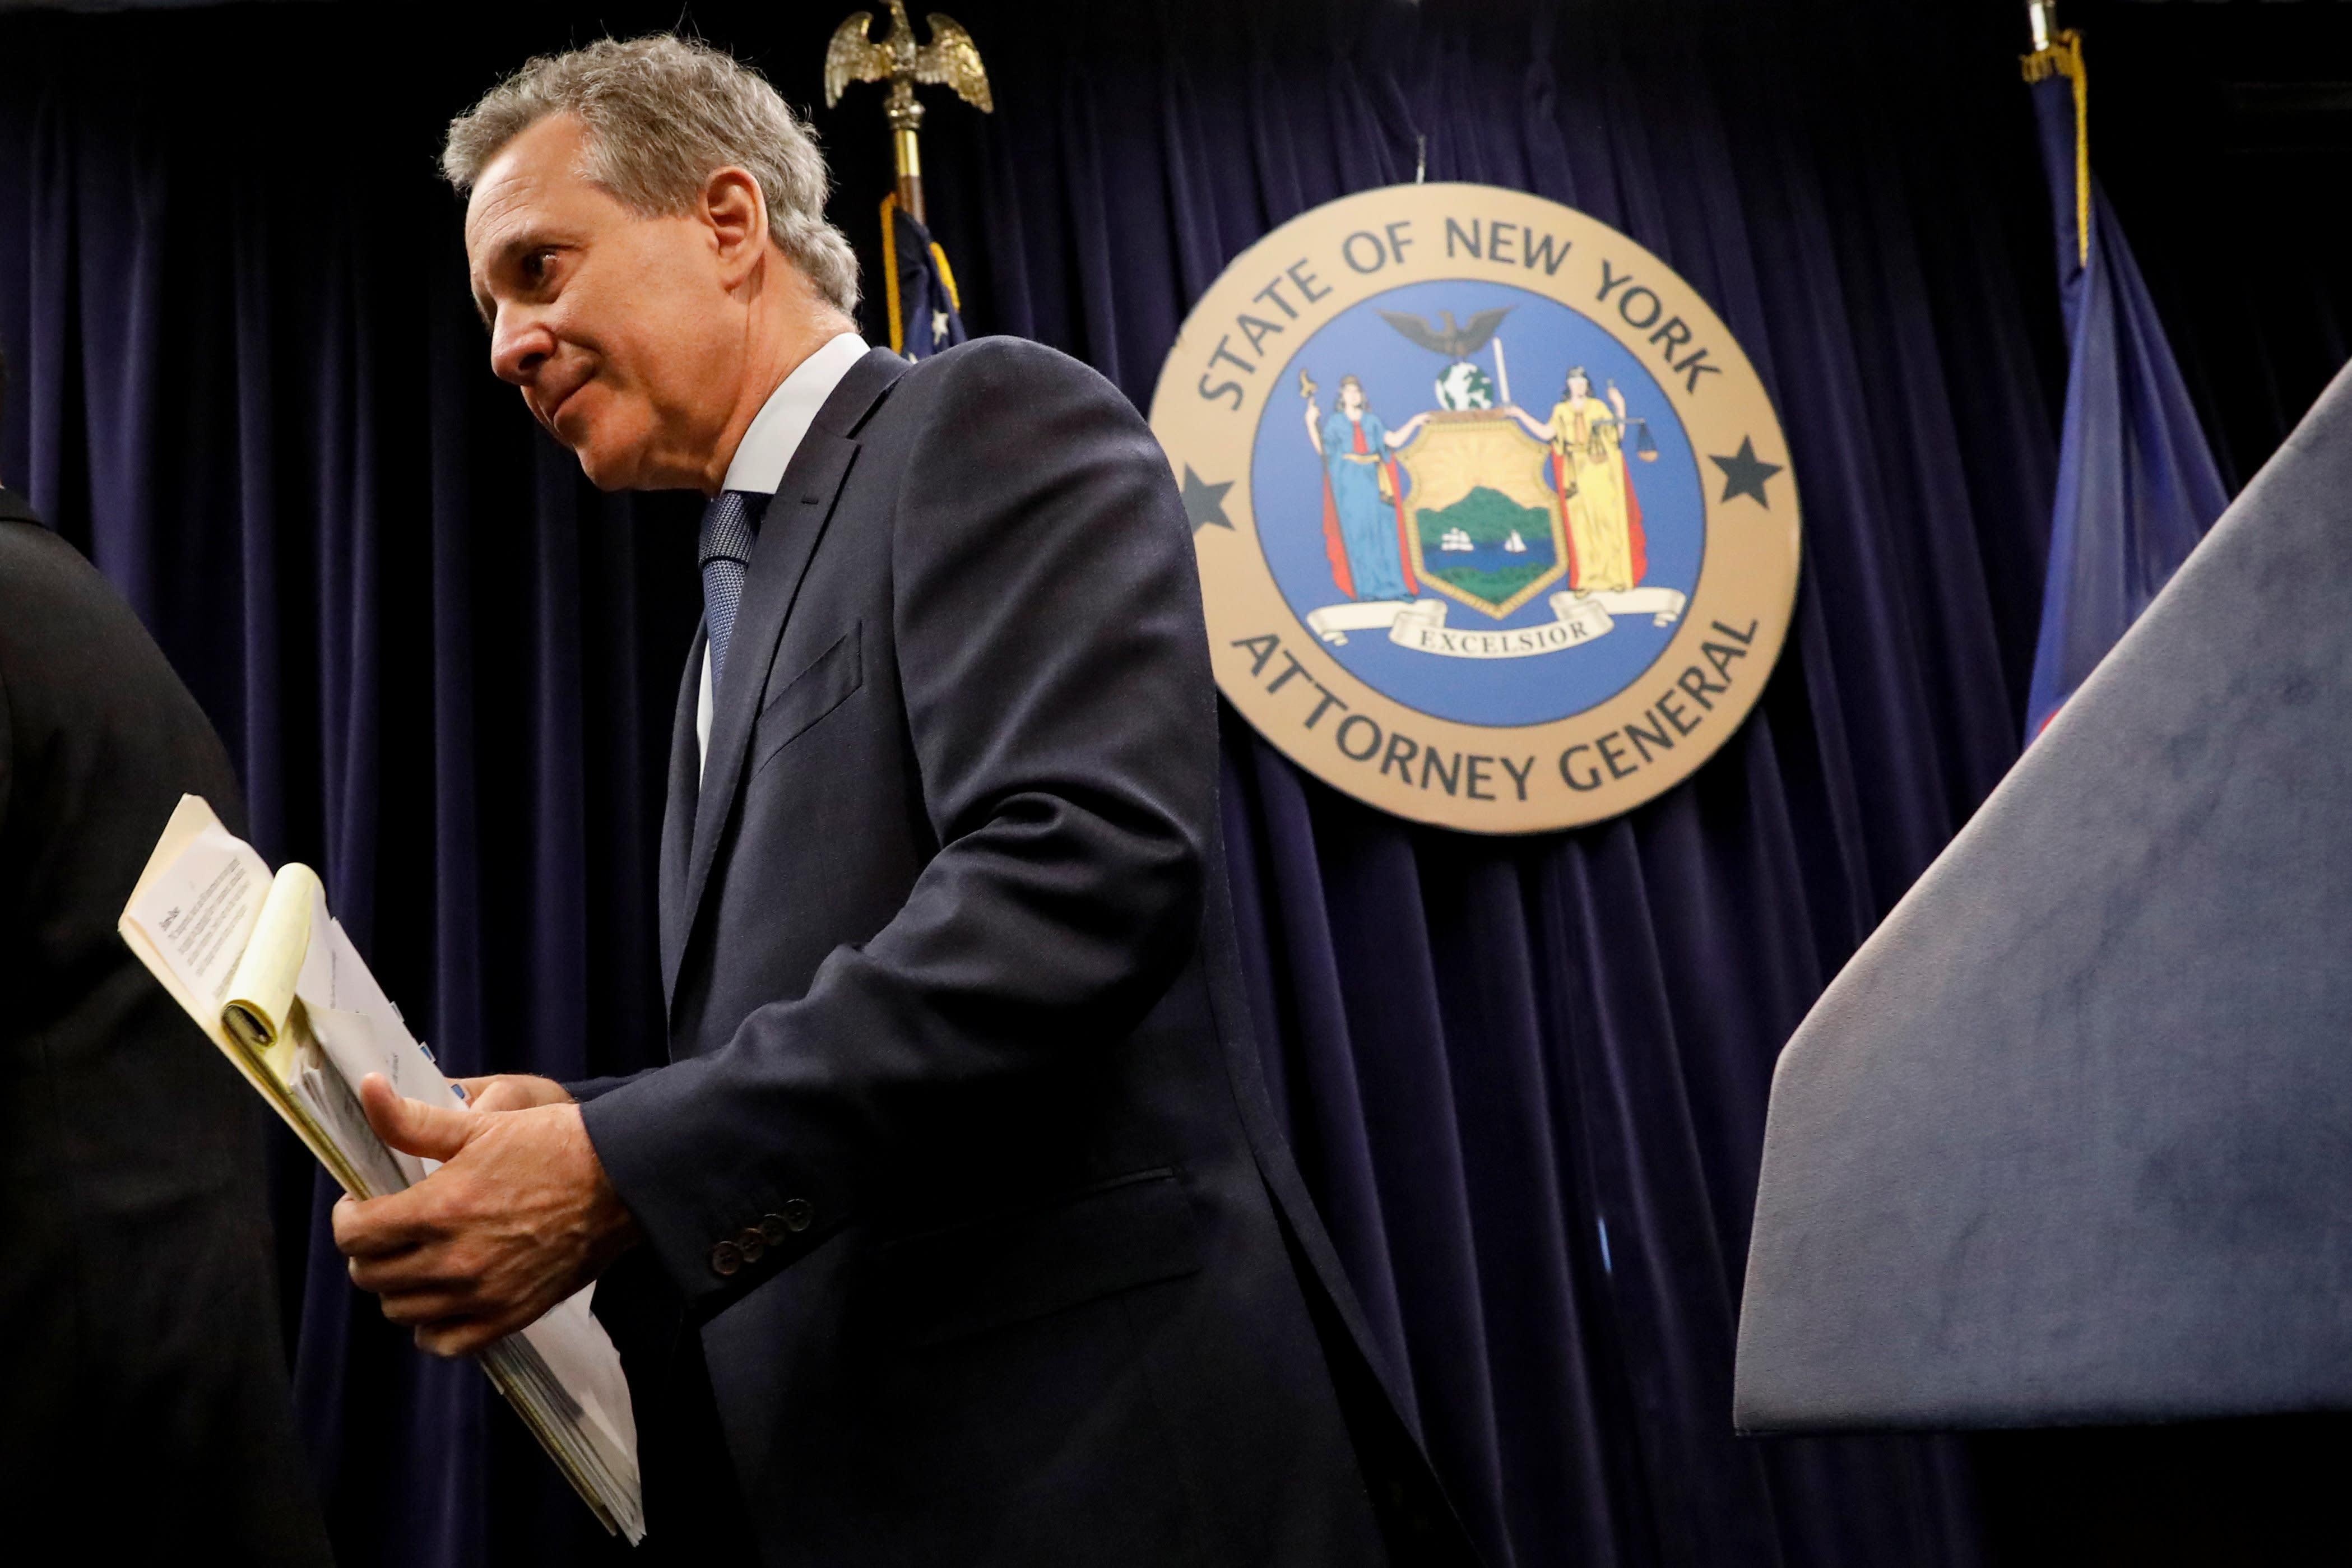 New York Attorney General Eric Schneiderman (D) announced his resignation on